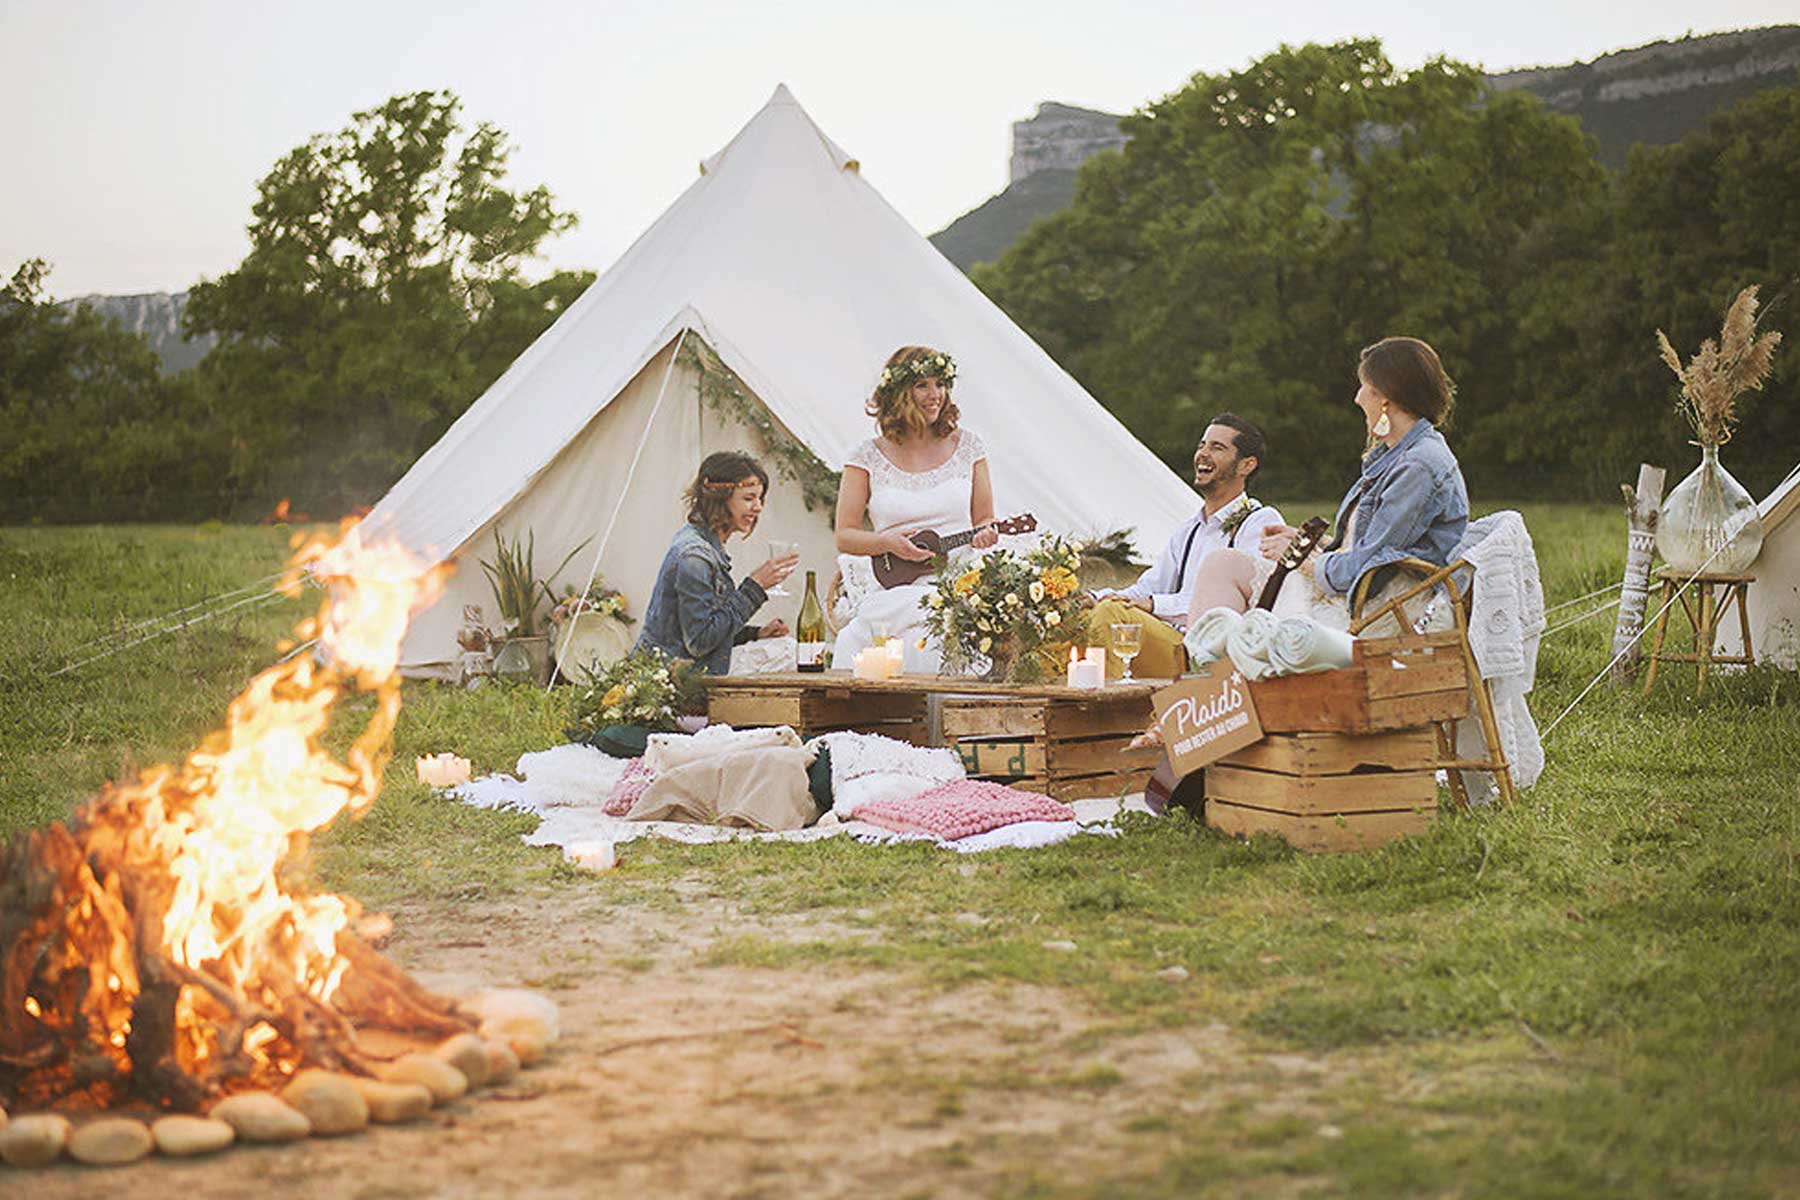 location tente mariage bucolique mon wedding camping. Black Bedroom Furniture Sets. Home Design Ideas